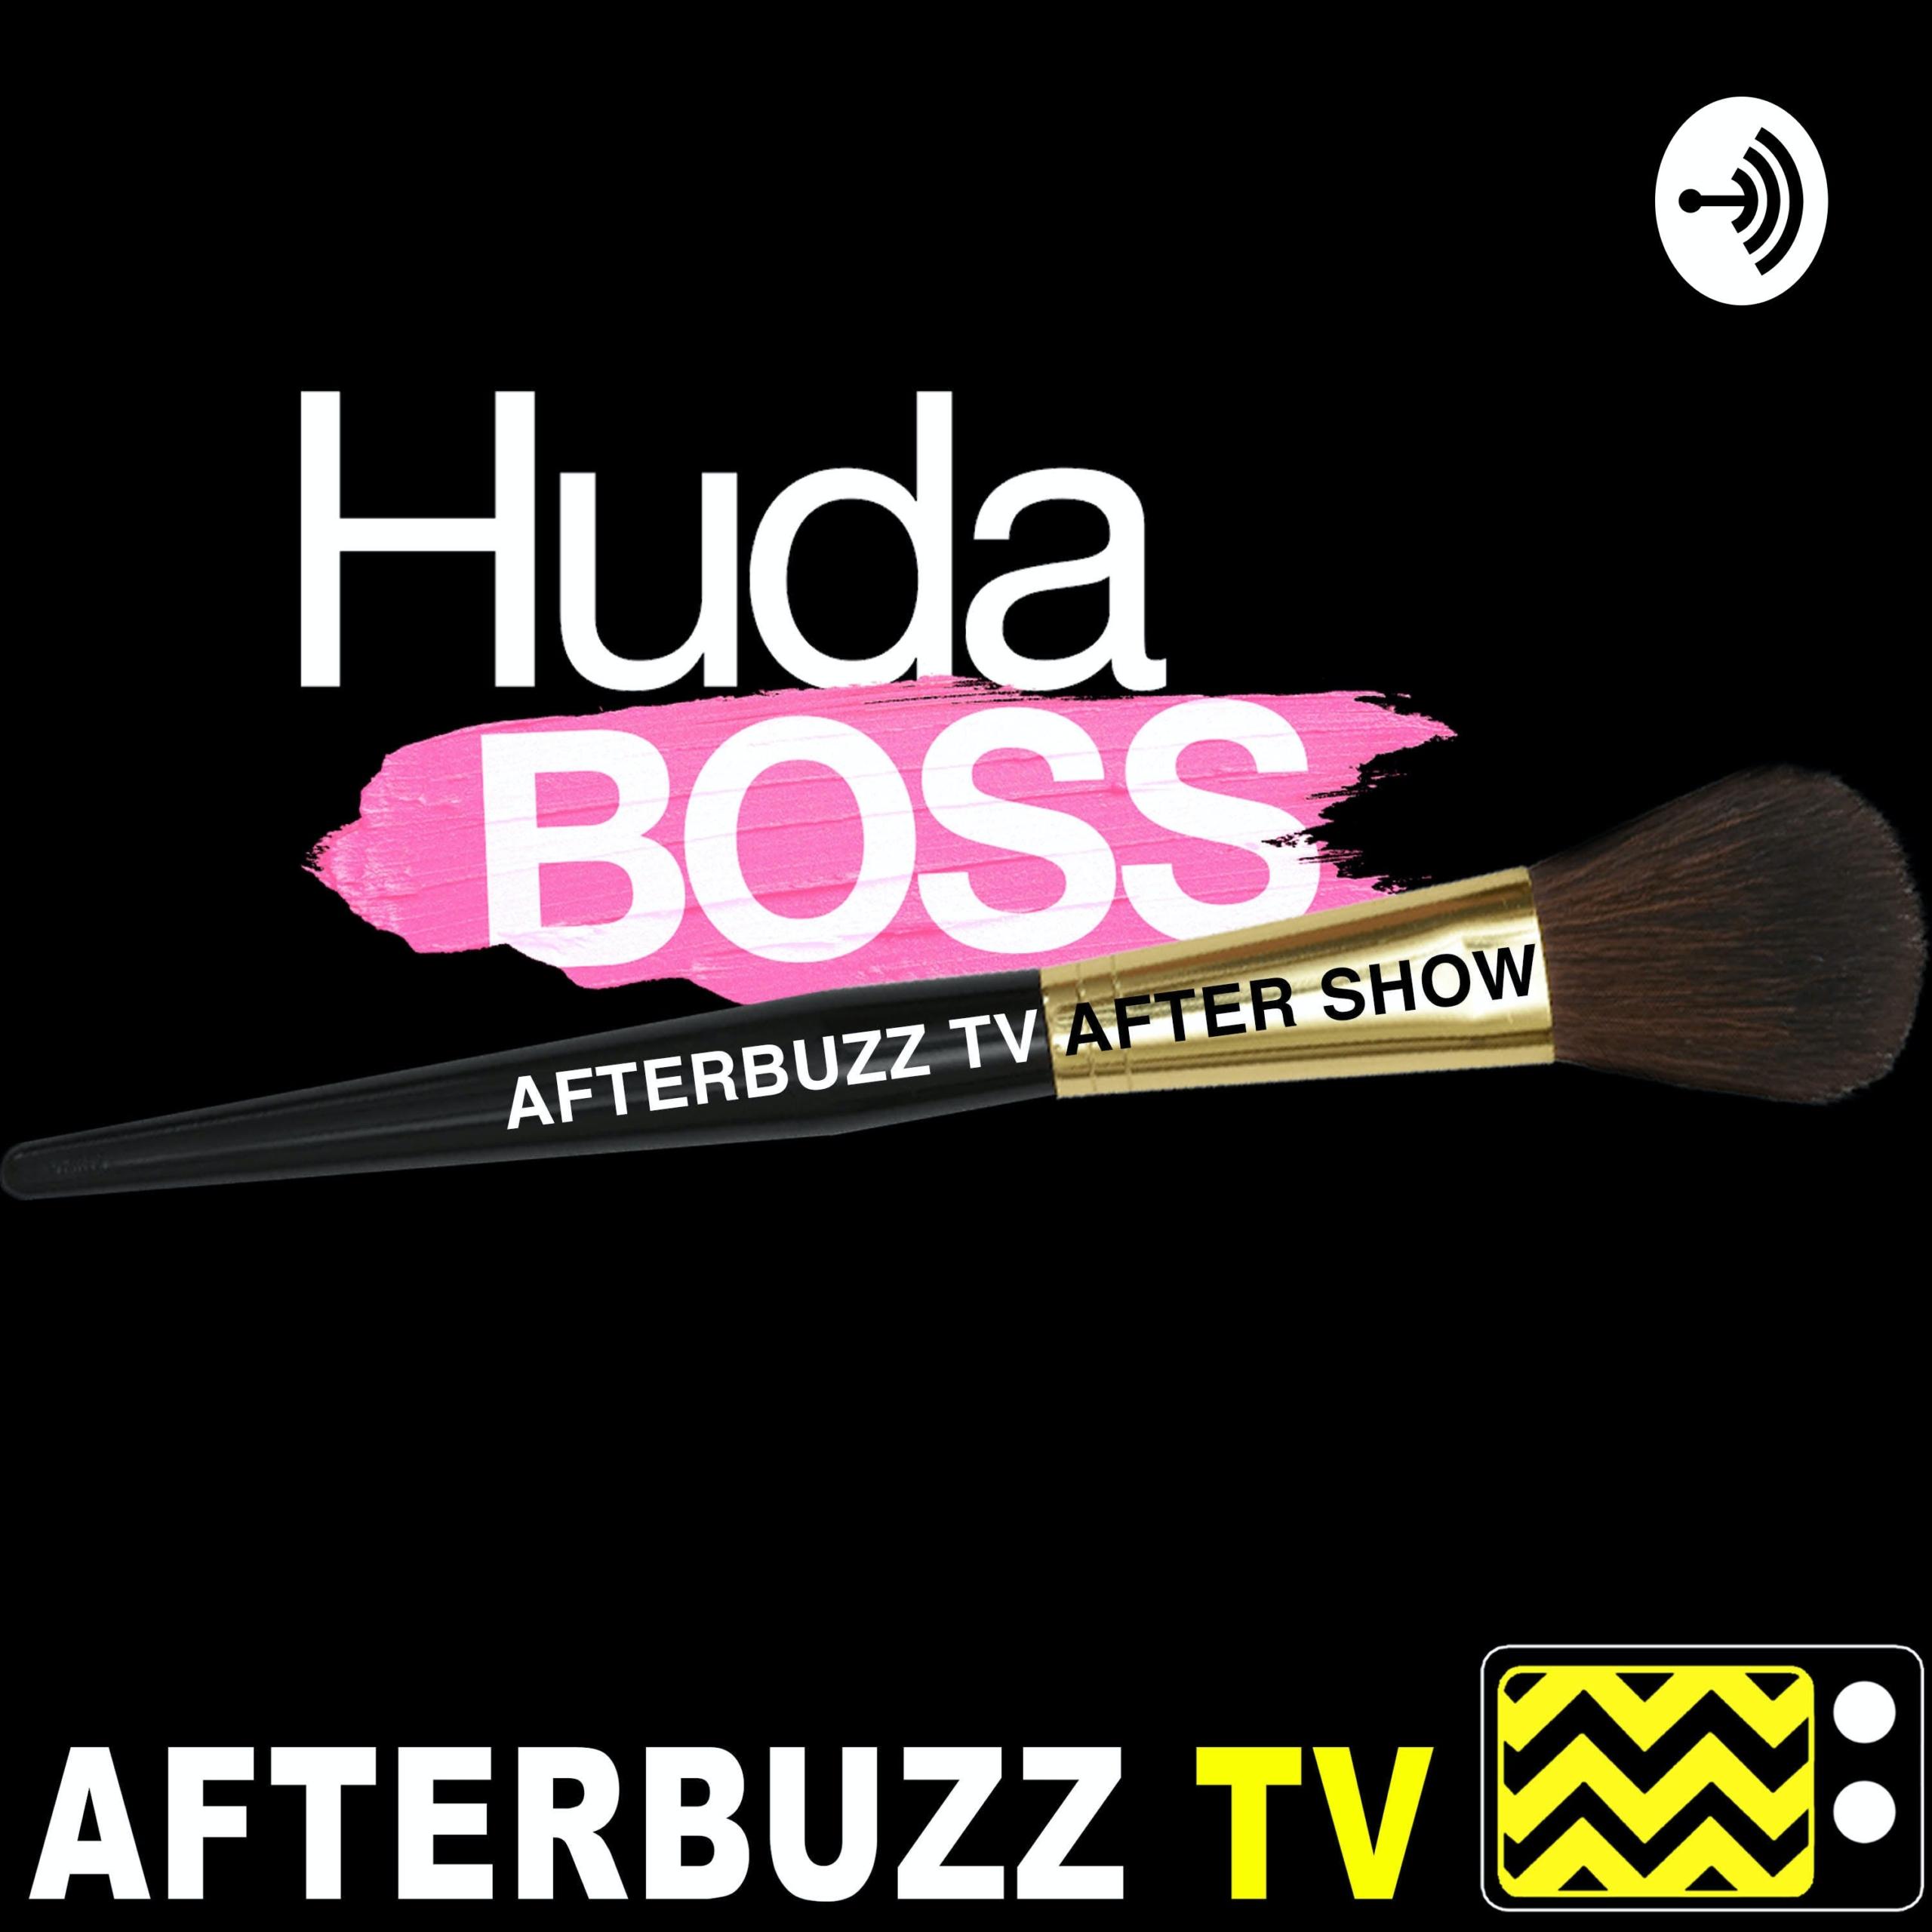 The Huda Boss Podcast